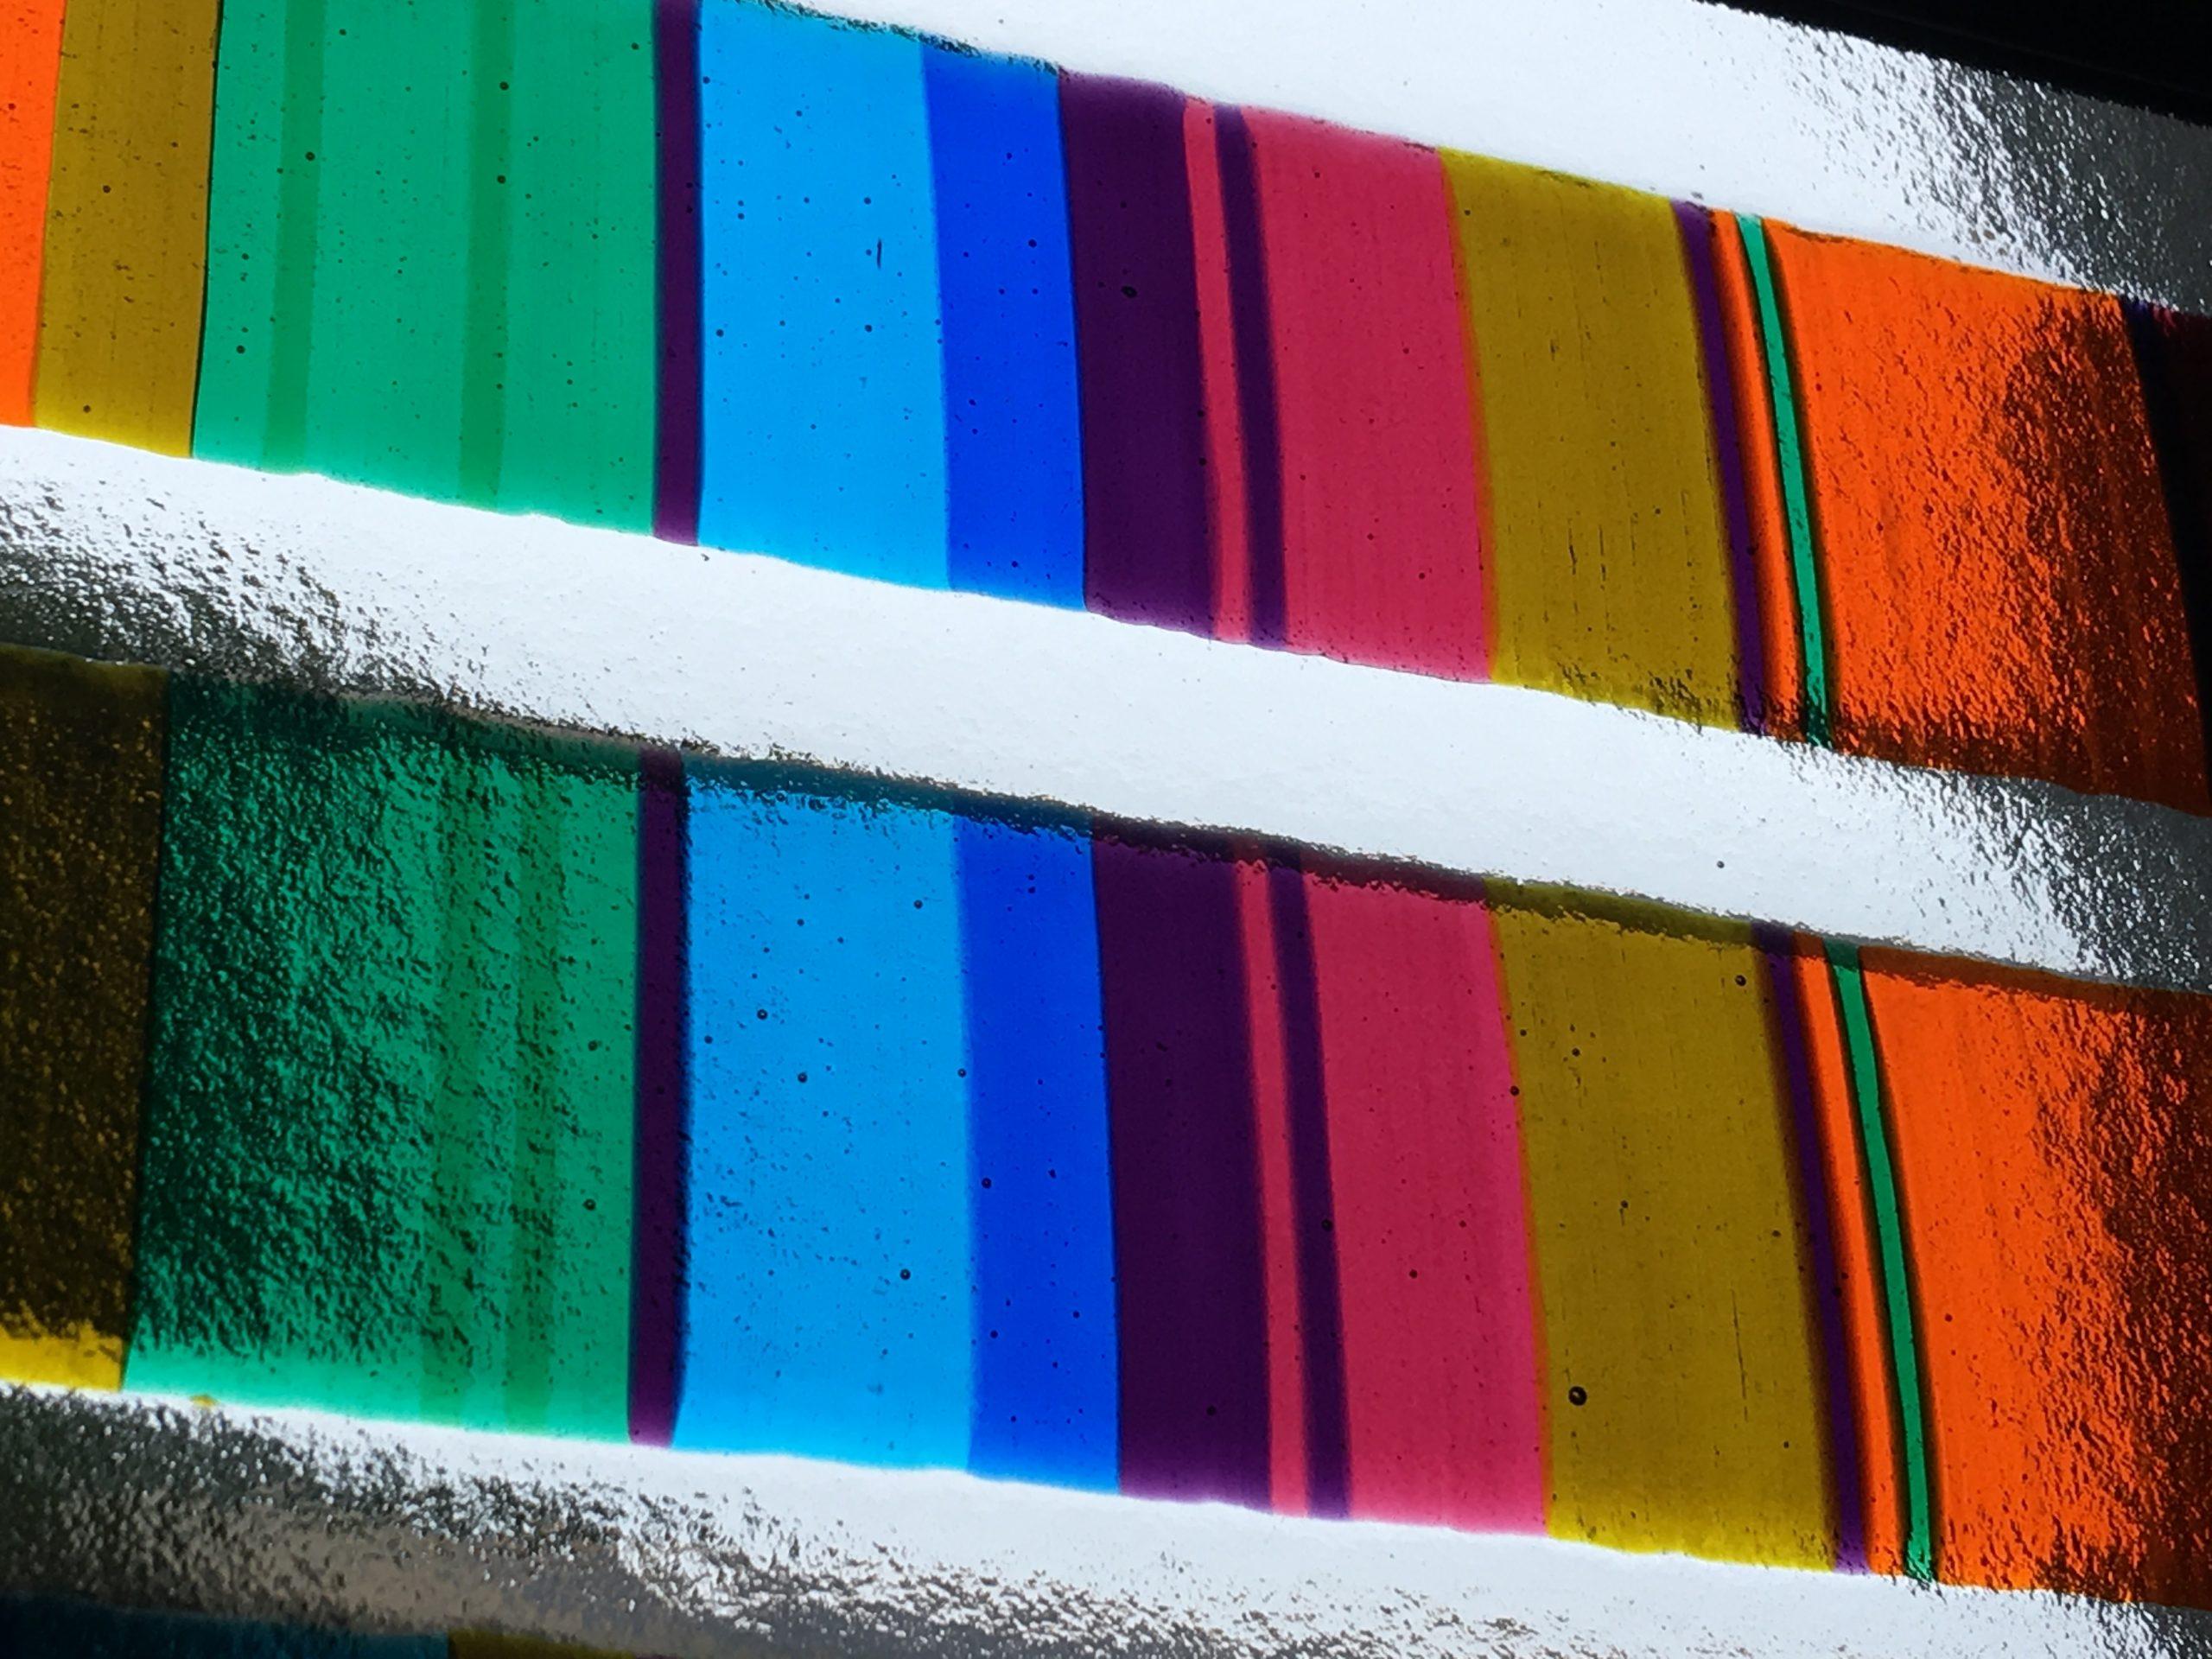 Pipes in Stripes